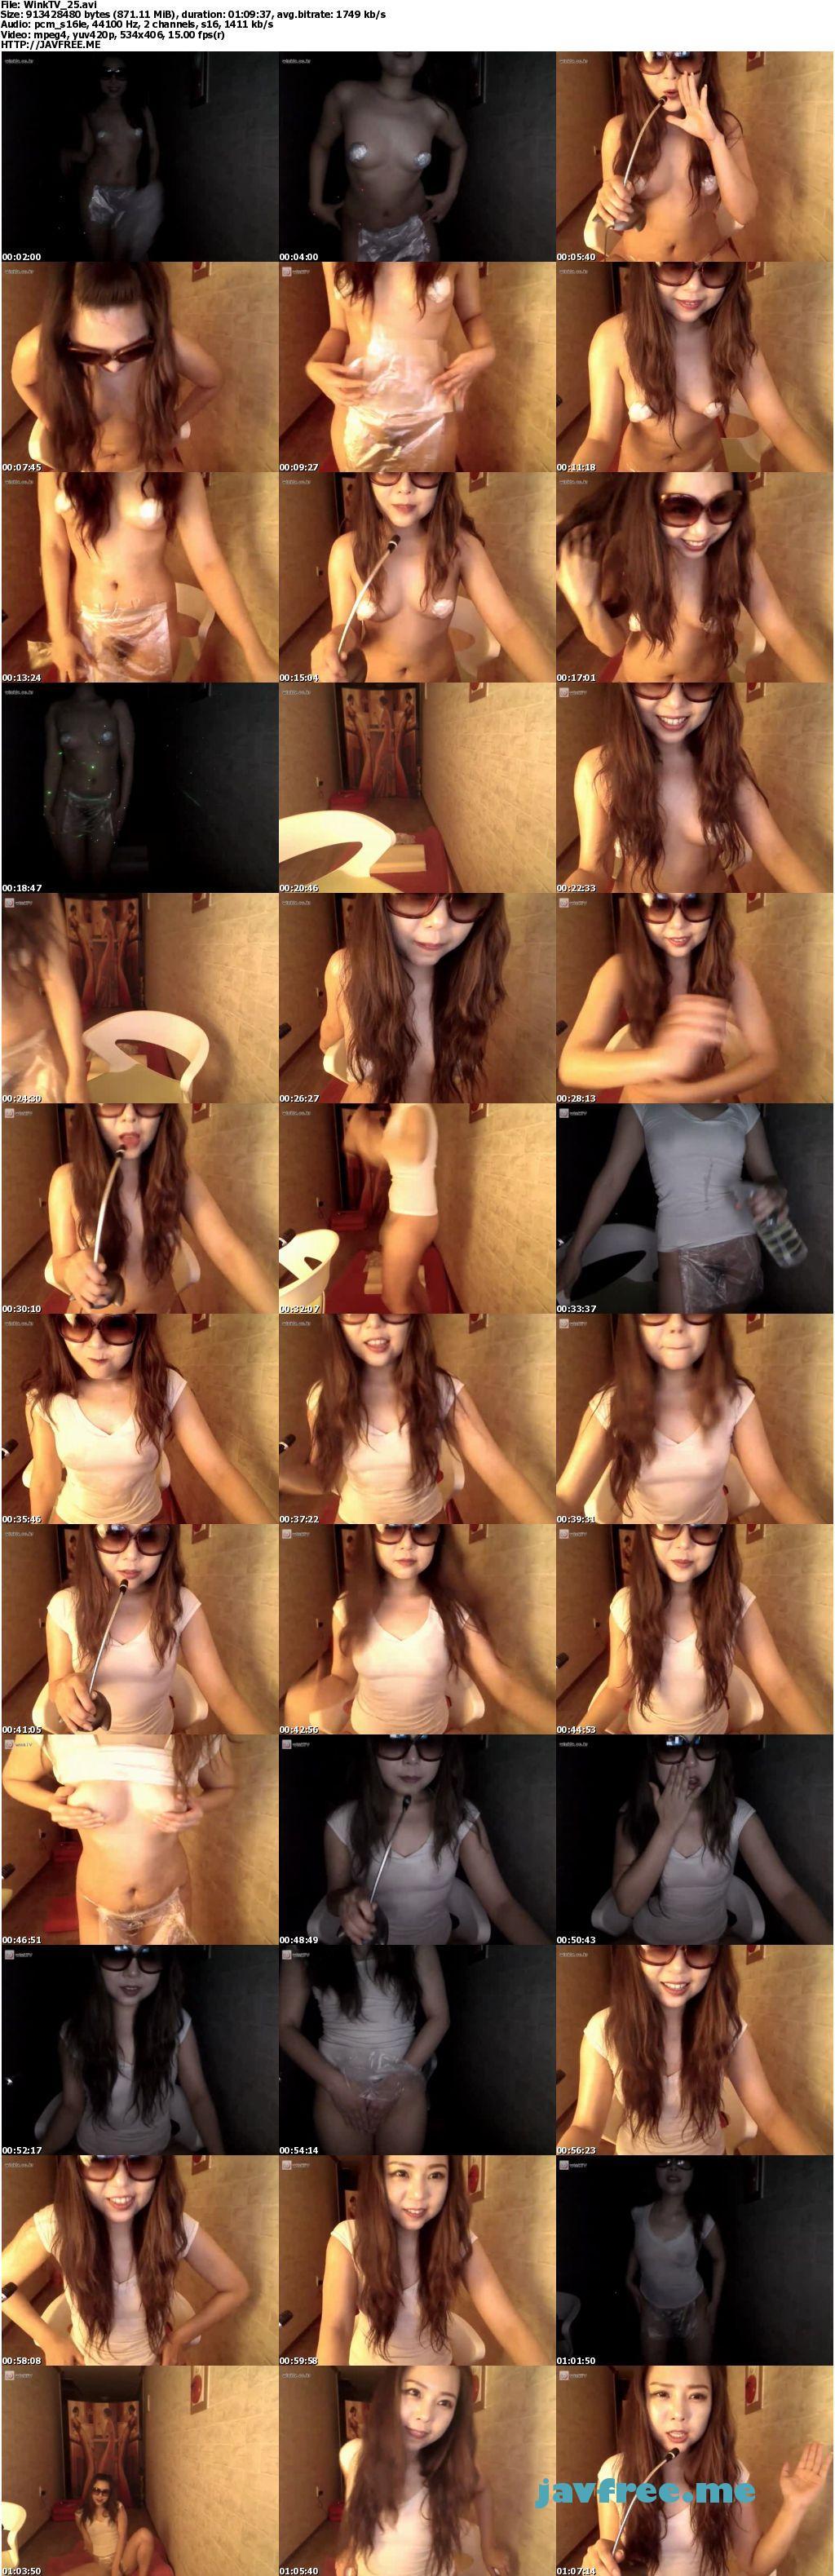 Hot girl nude show cam - Korea girl beautiful like angel part3 - image WinkTV_25 on https://javfree.me